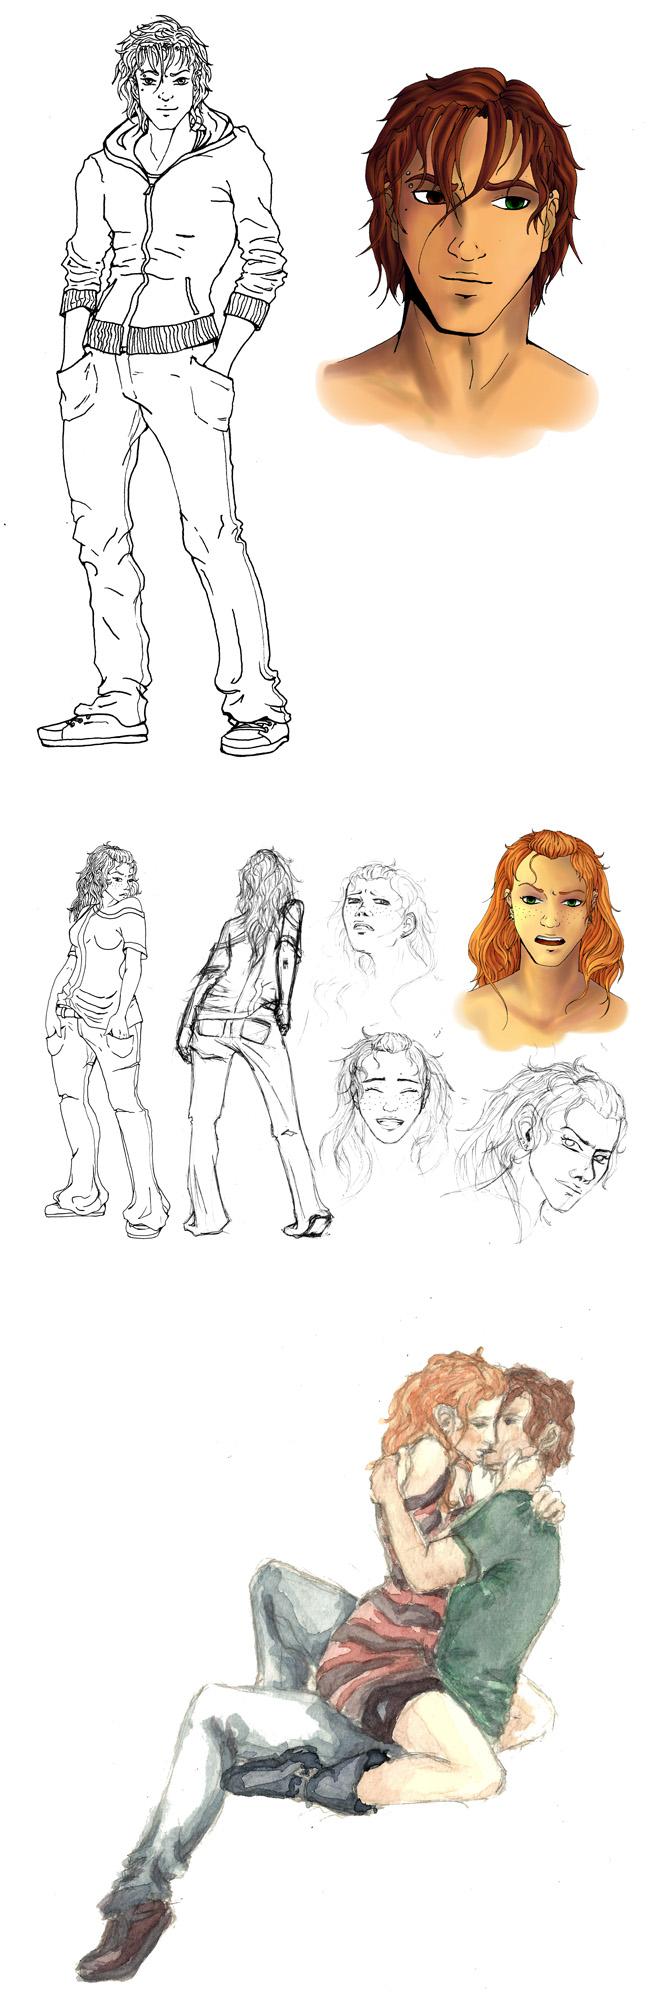 diseño-personajes-comic-manga-alumnos-cursos-madrid-academiac10